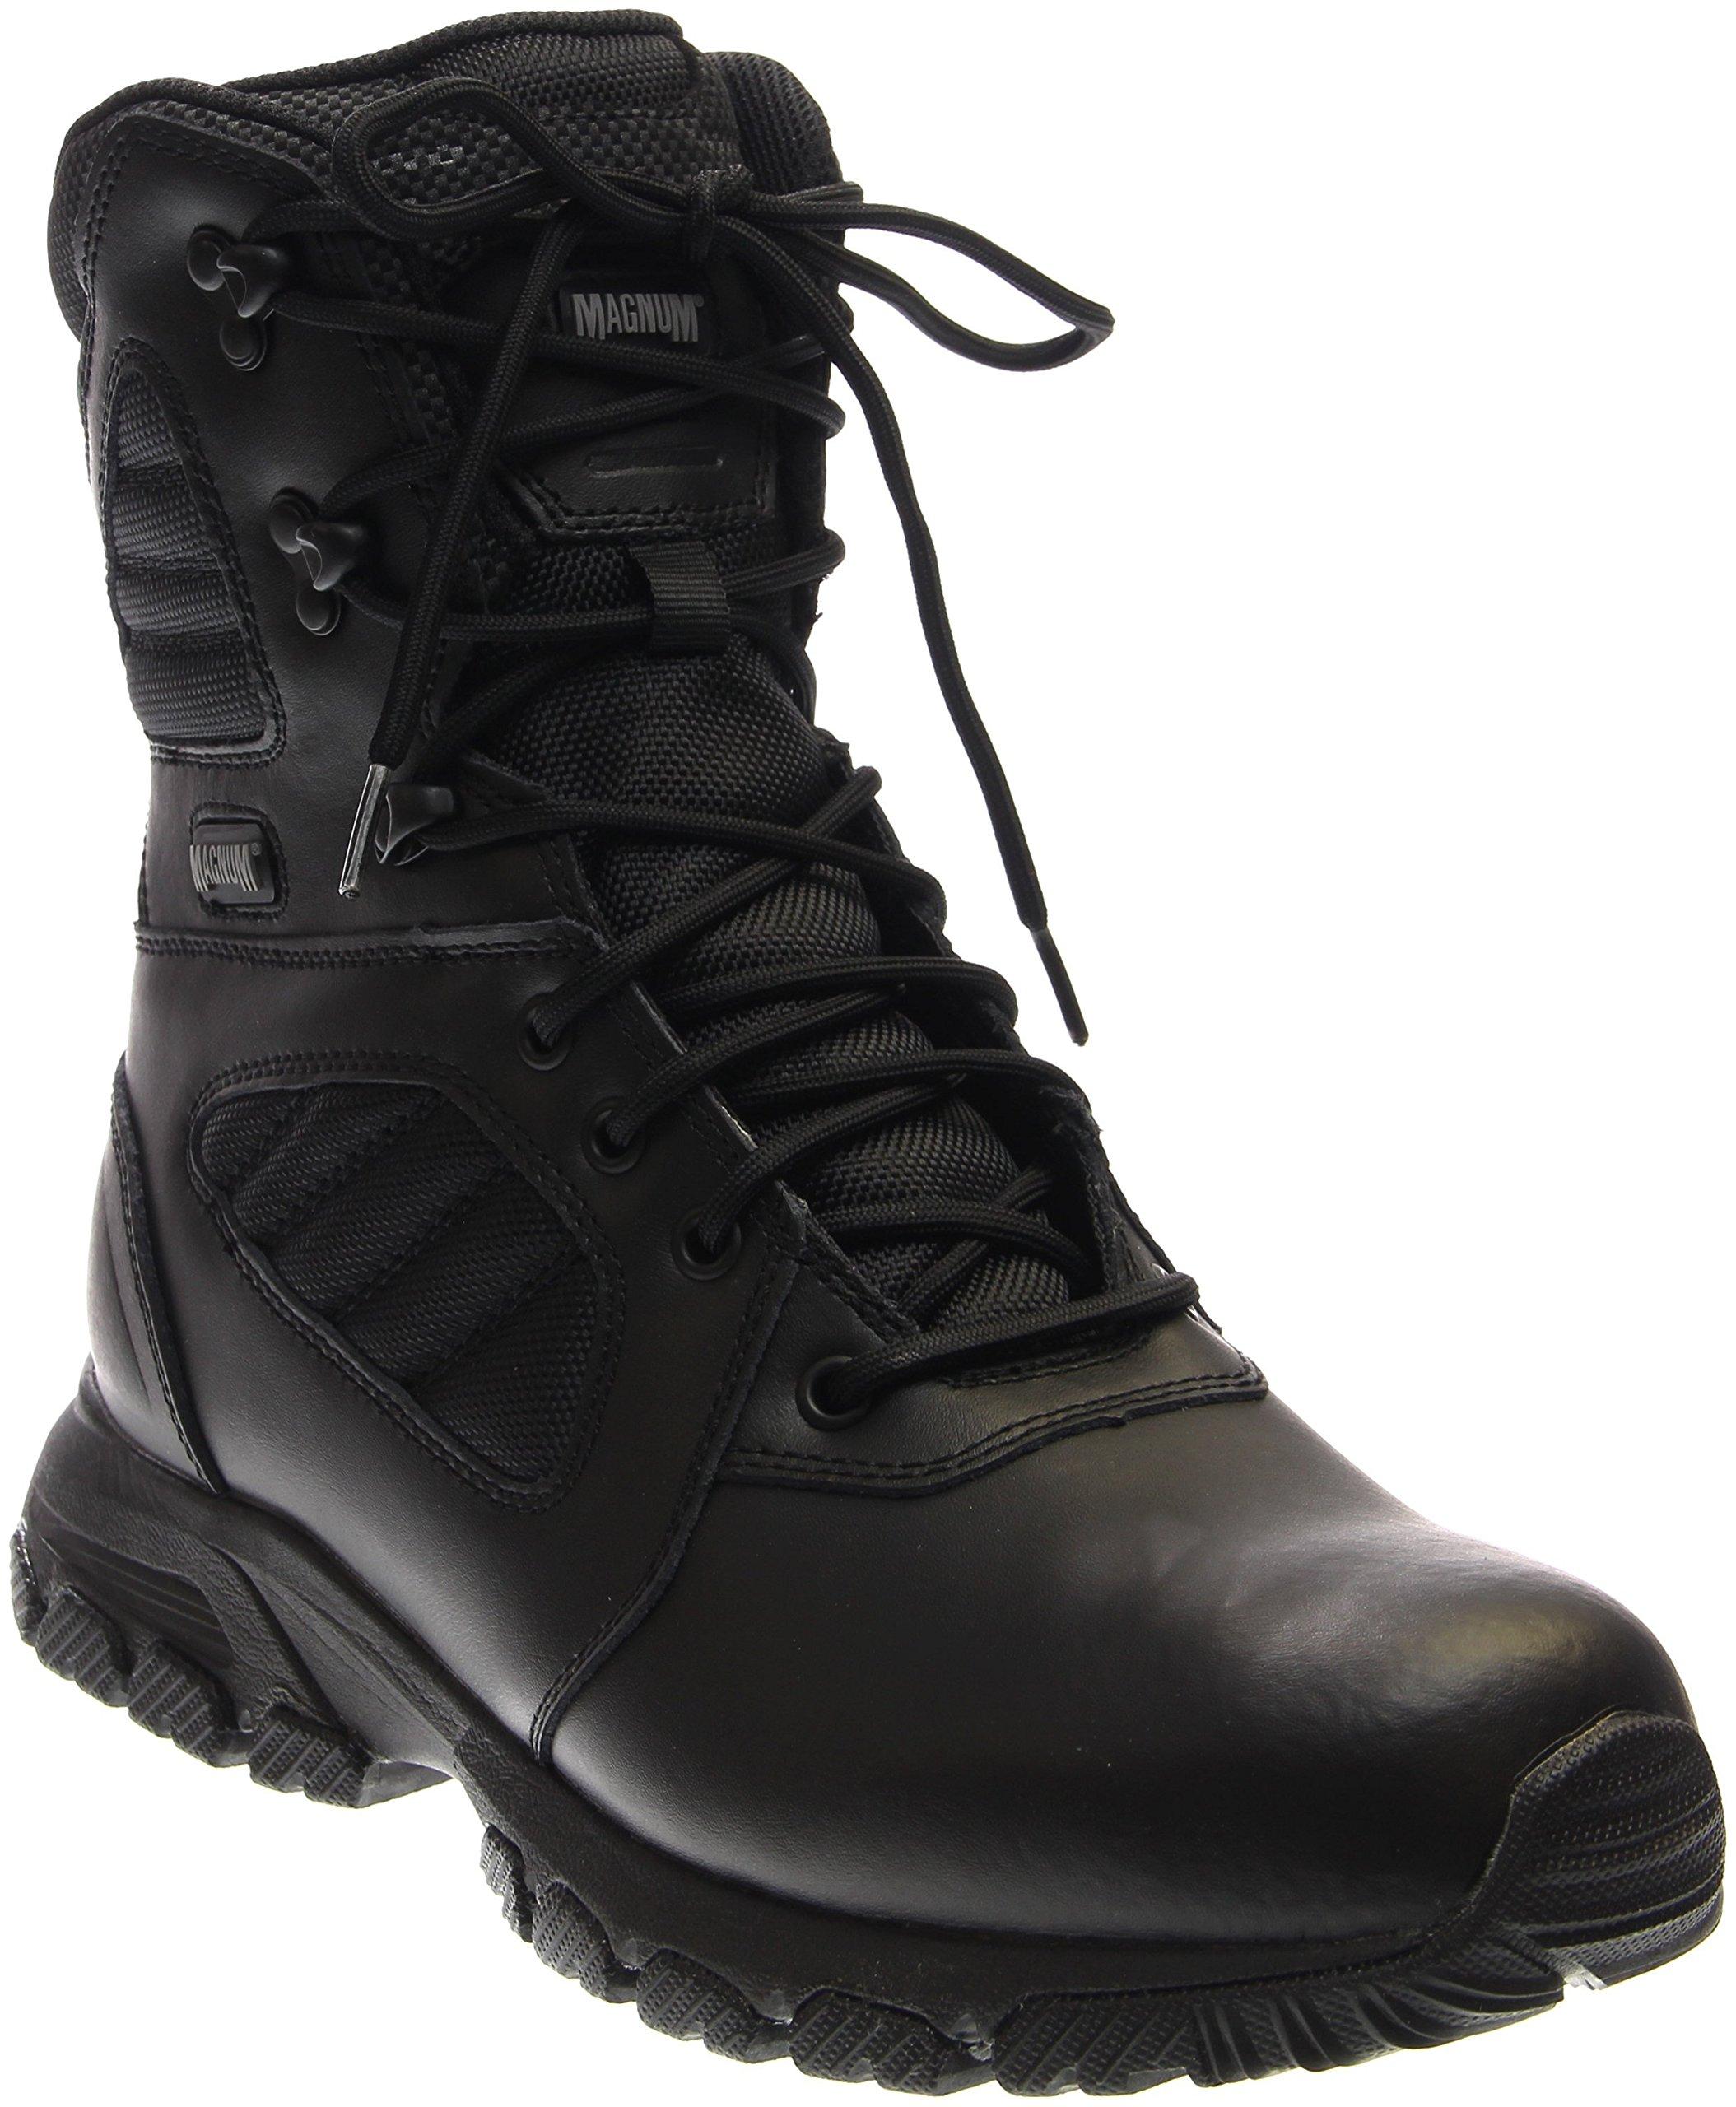 Magnum Men's Response III 8.0 Side-Zip Slip Resistant Work Boot,Black,13 M US by Magnum